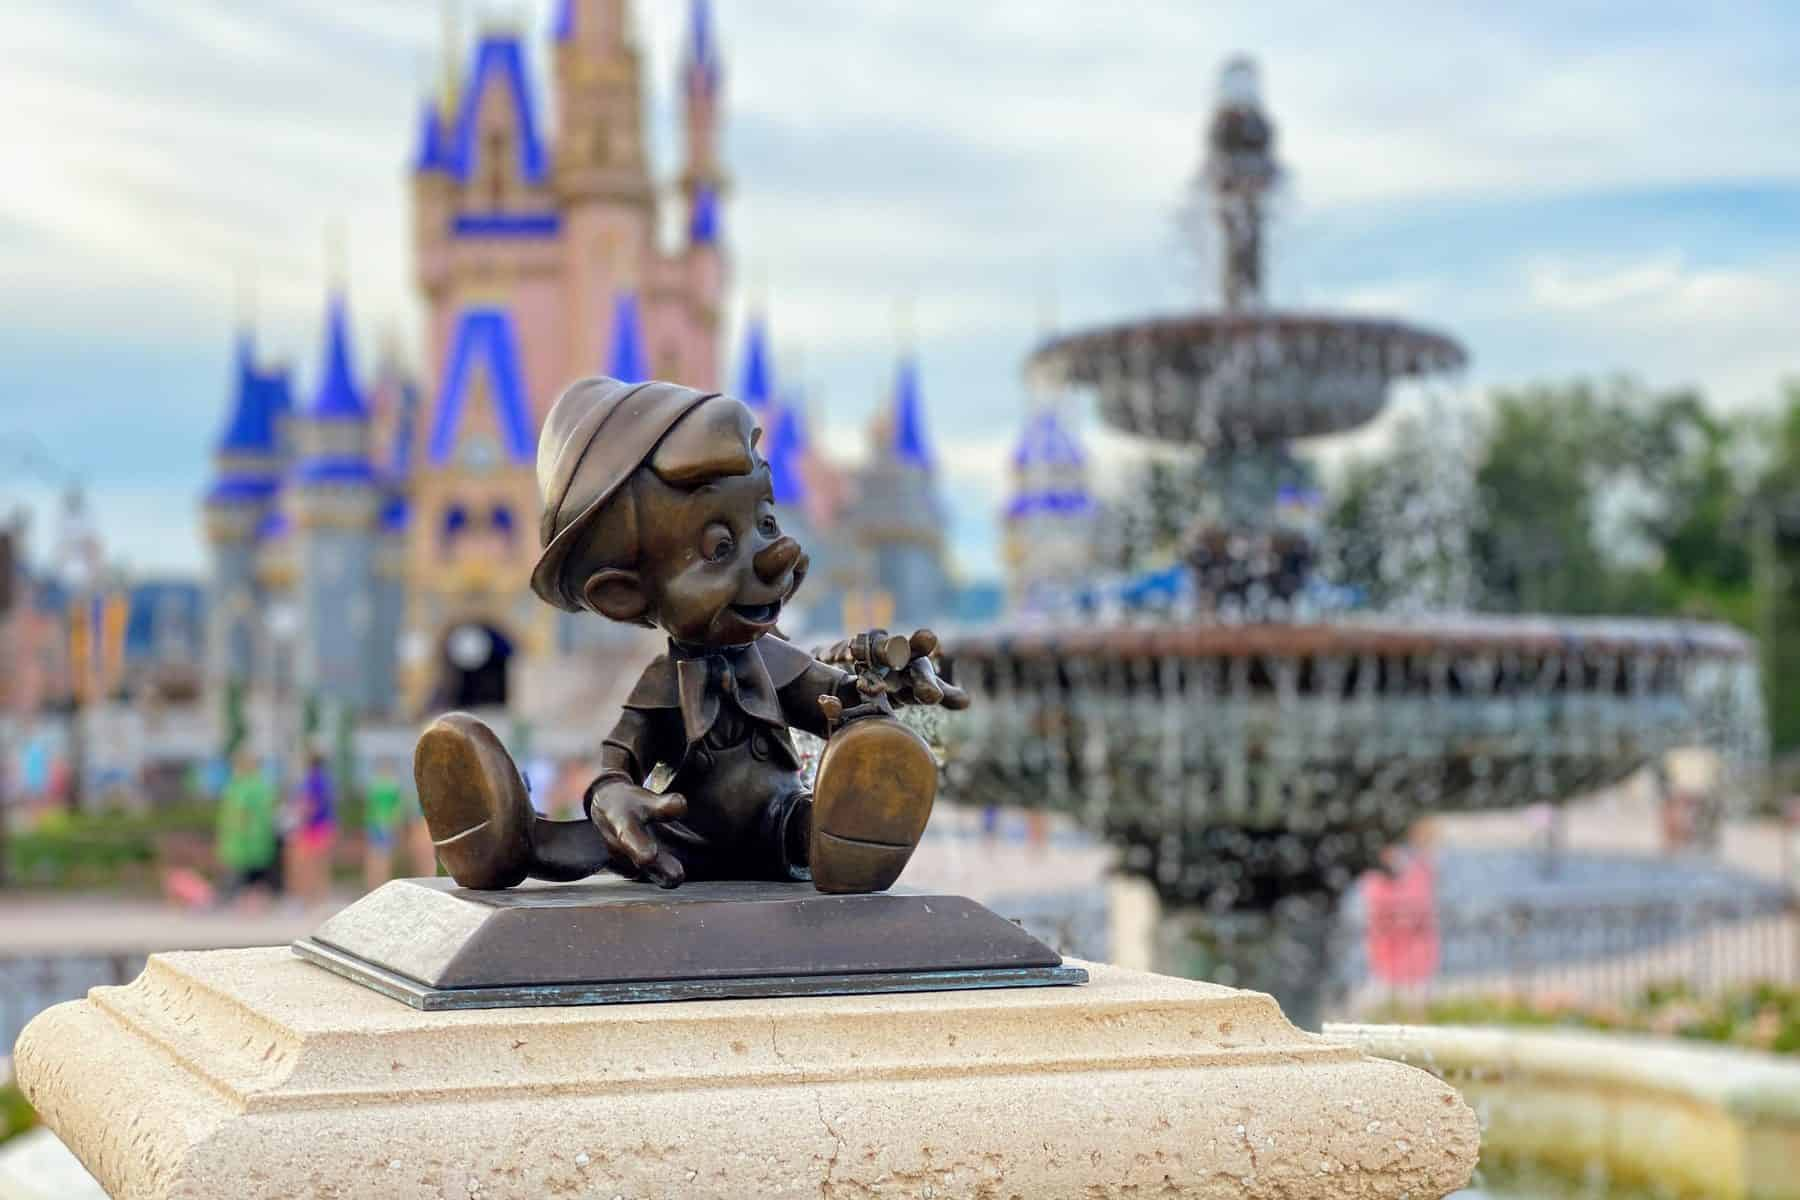 Pinocchio hub statue